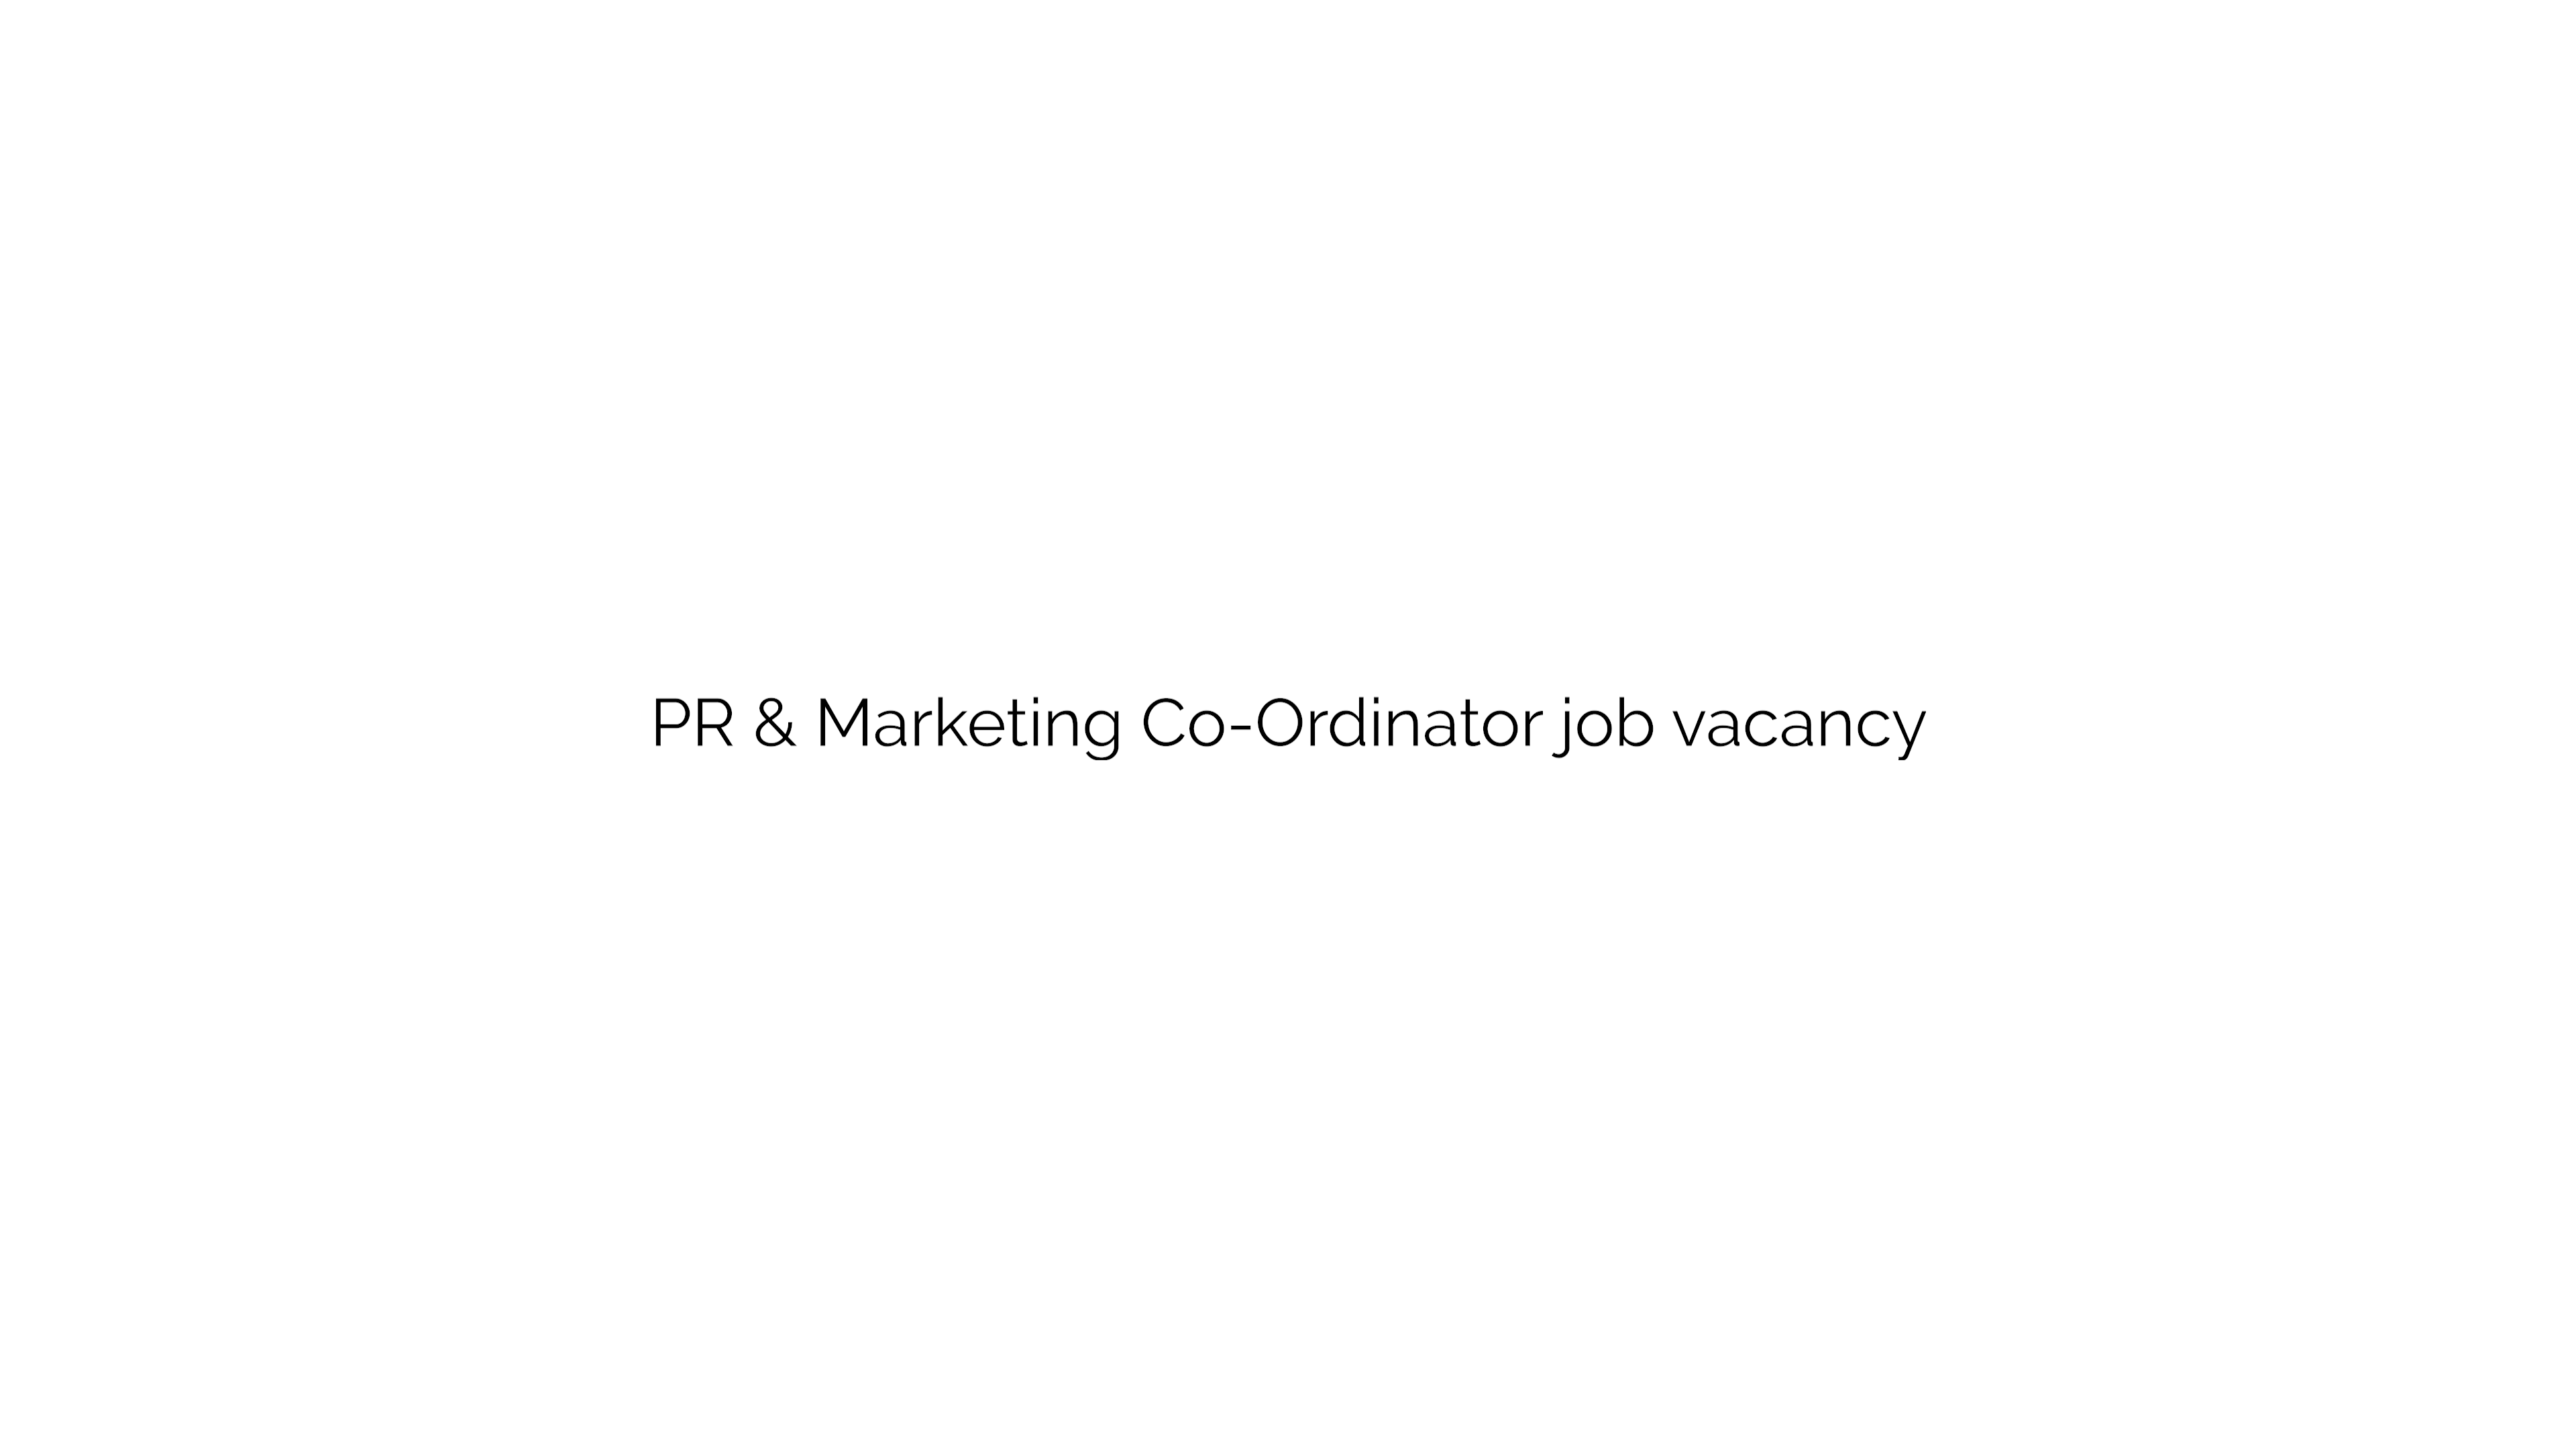 PR & Marketing Co-Ordinator job vacancy